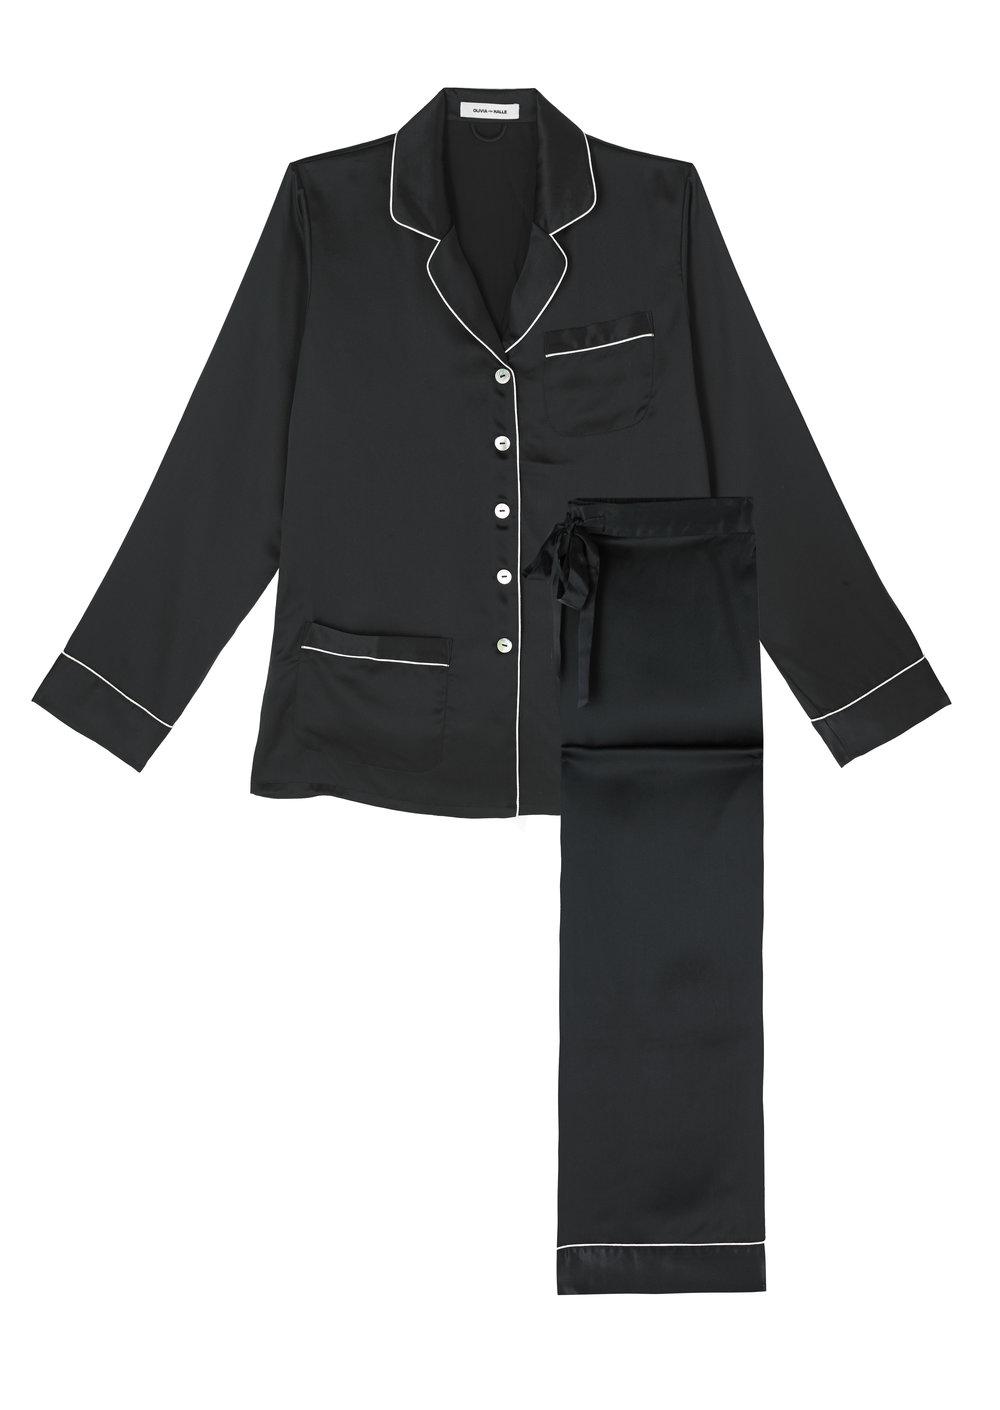 Olivia von Halle Coco Jet Black Pyjamas, Available at Oliva von Halle